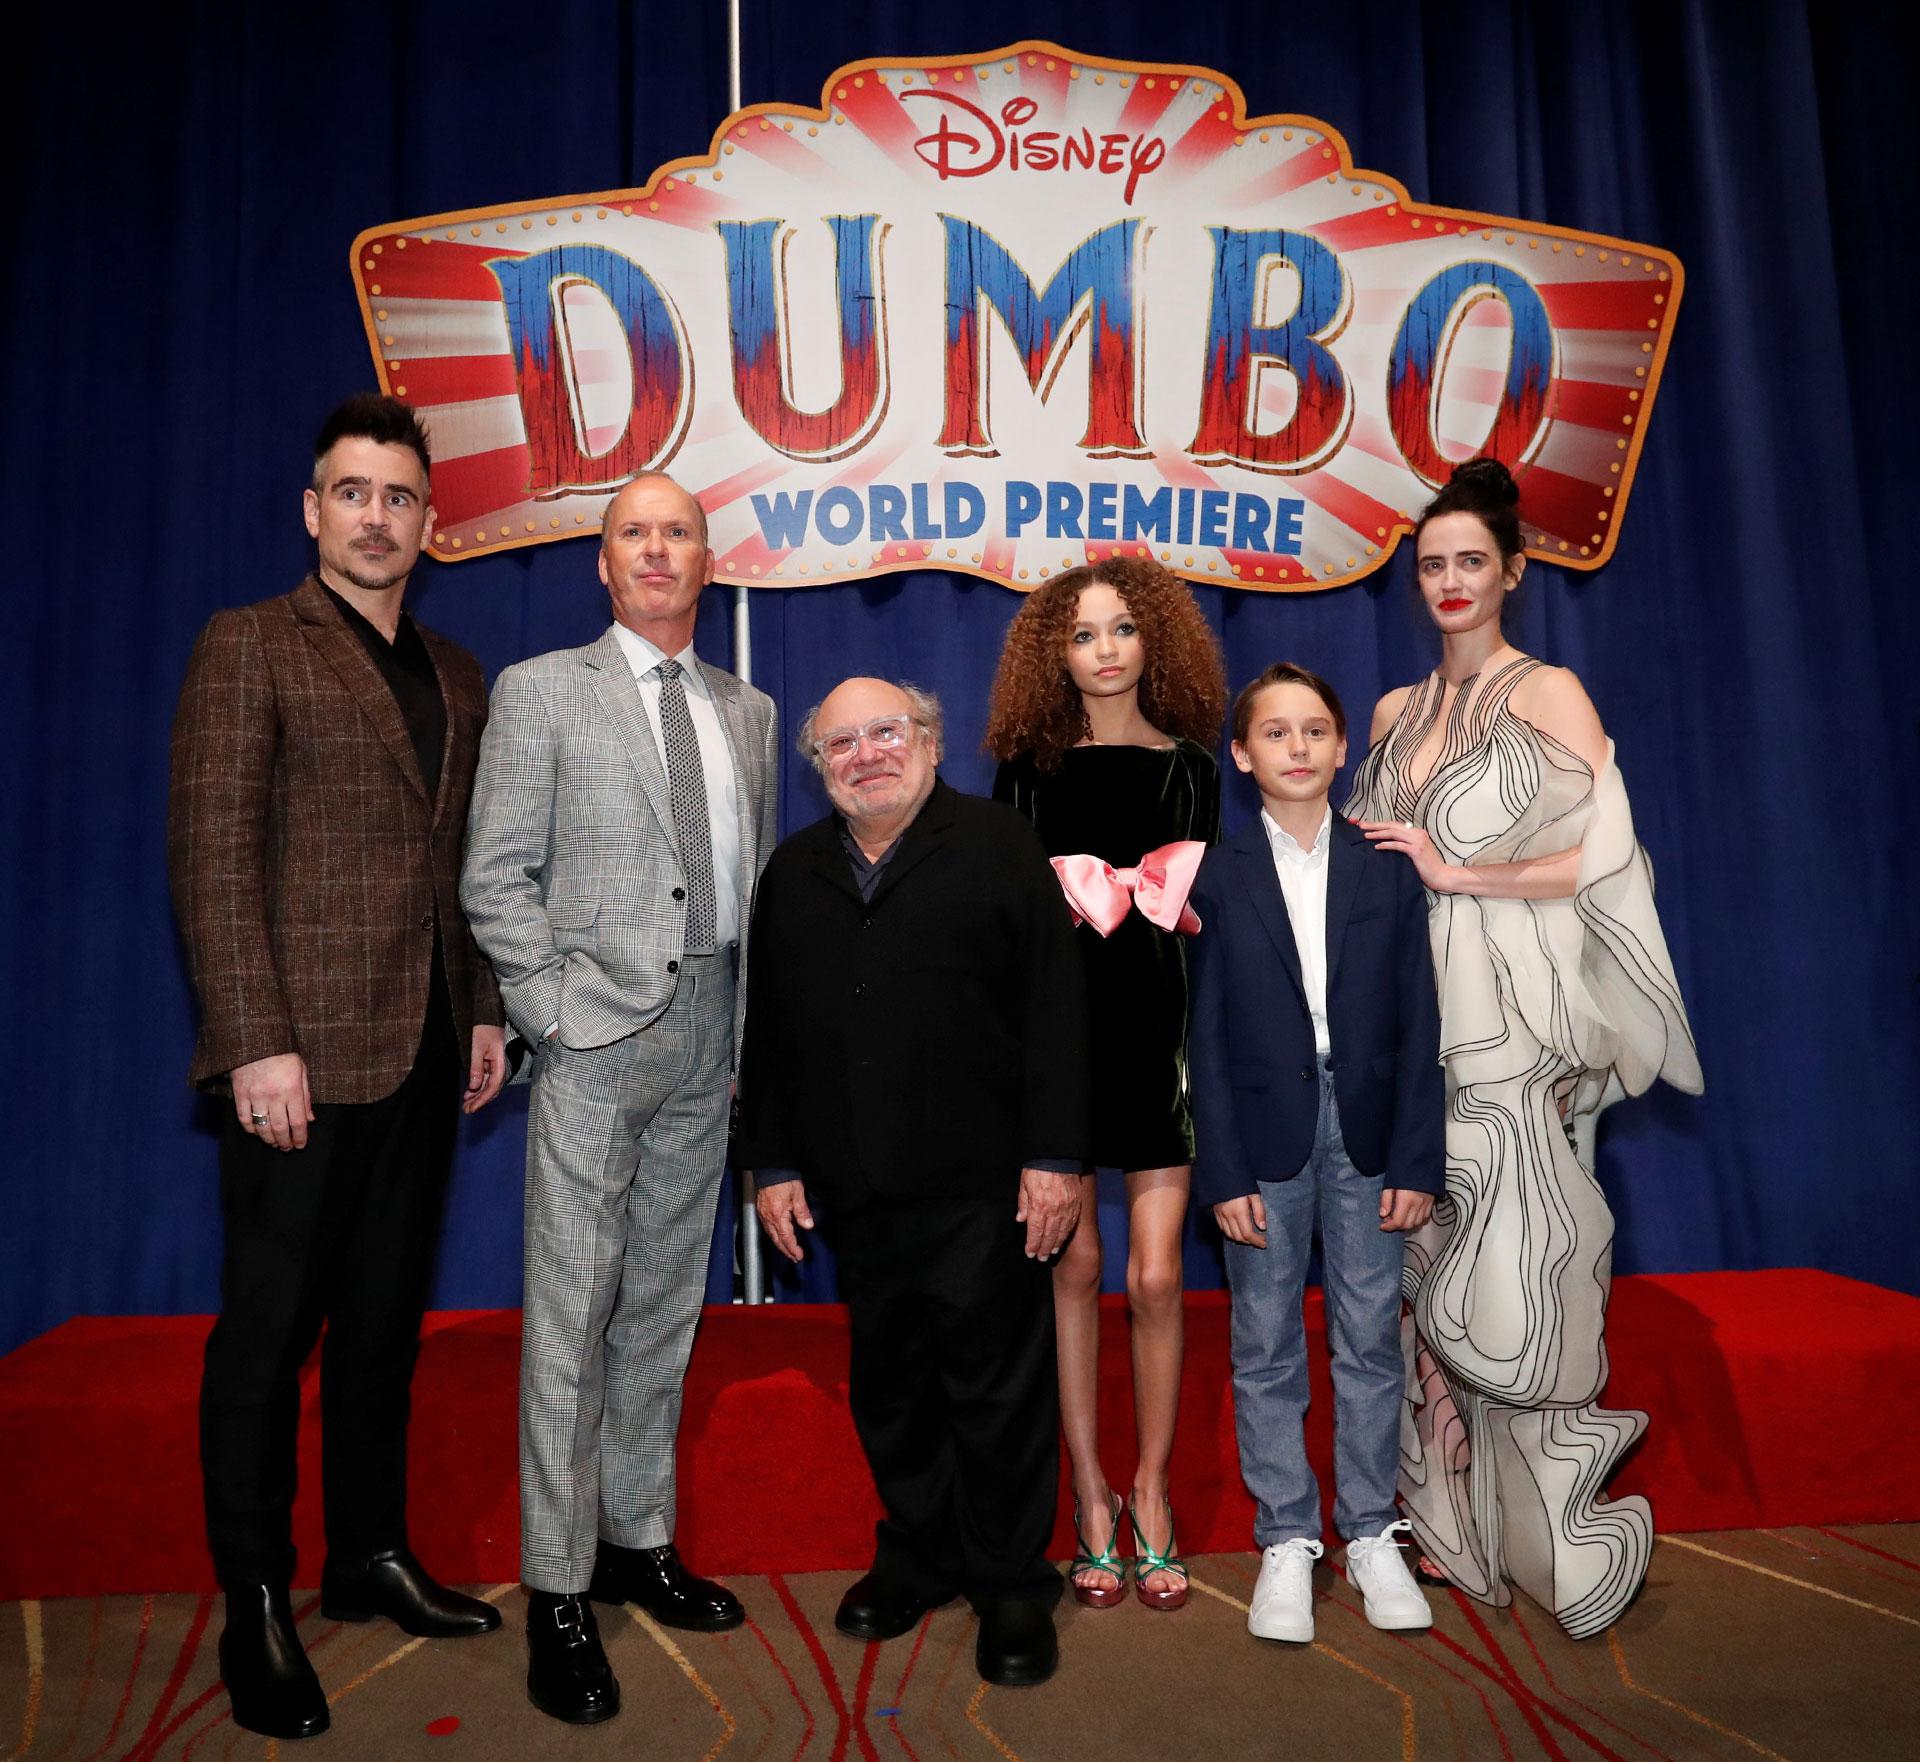 El cast completo del film 'Dumbo'